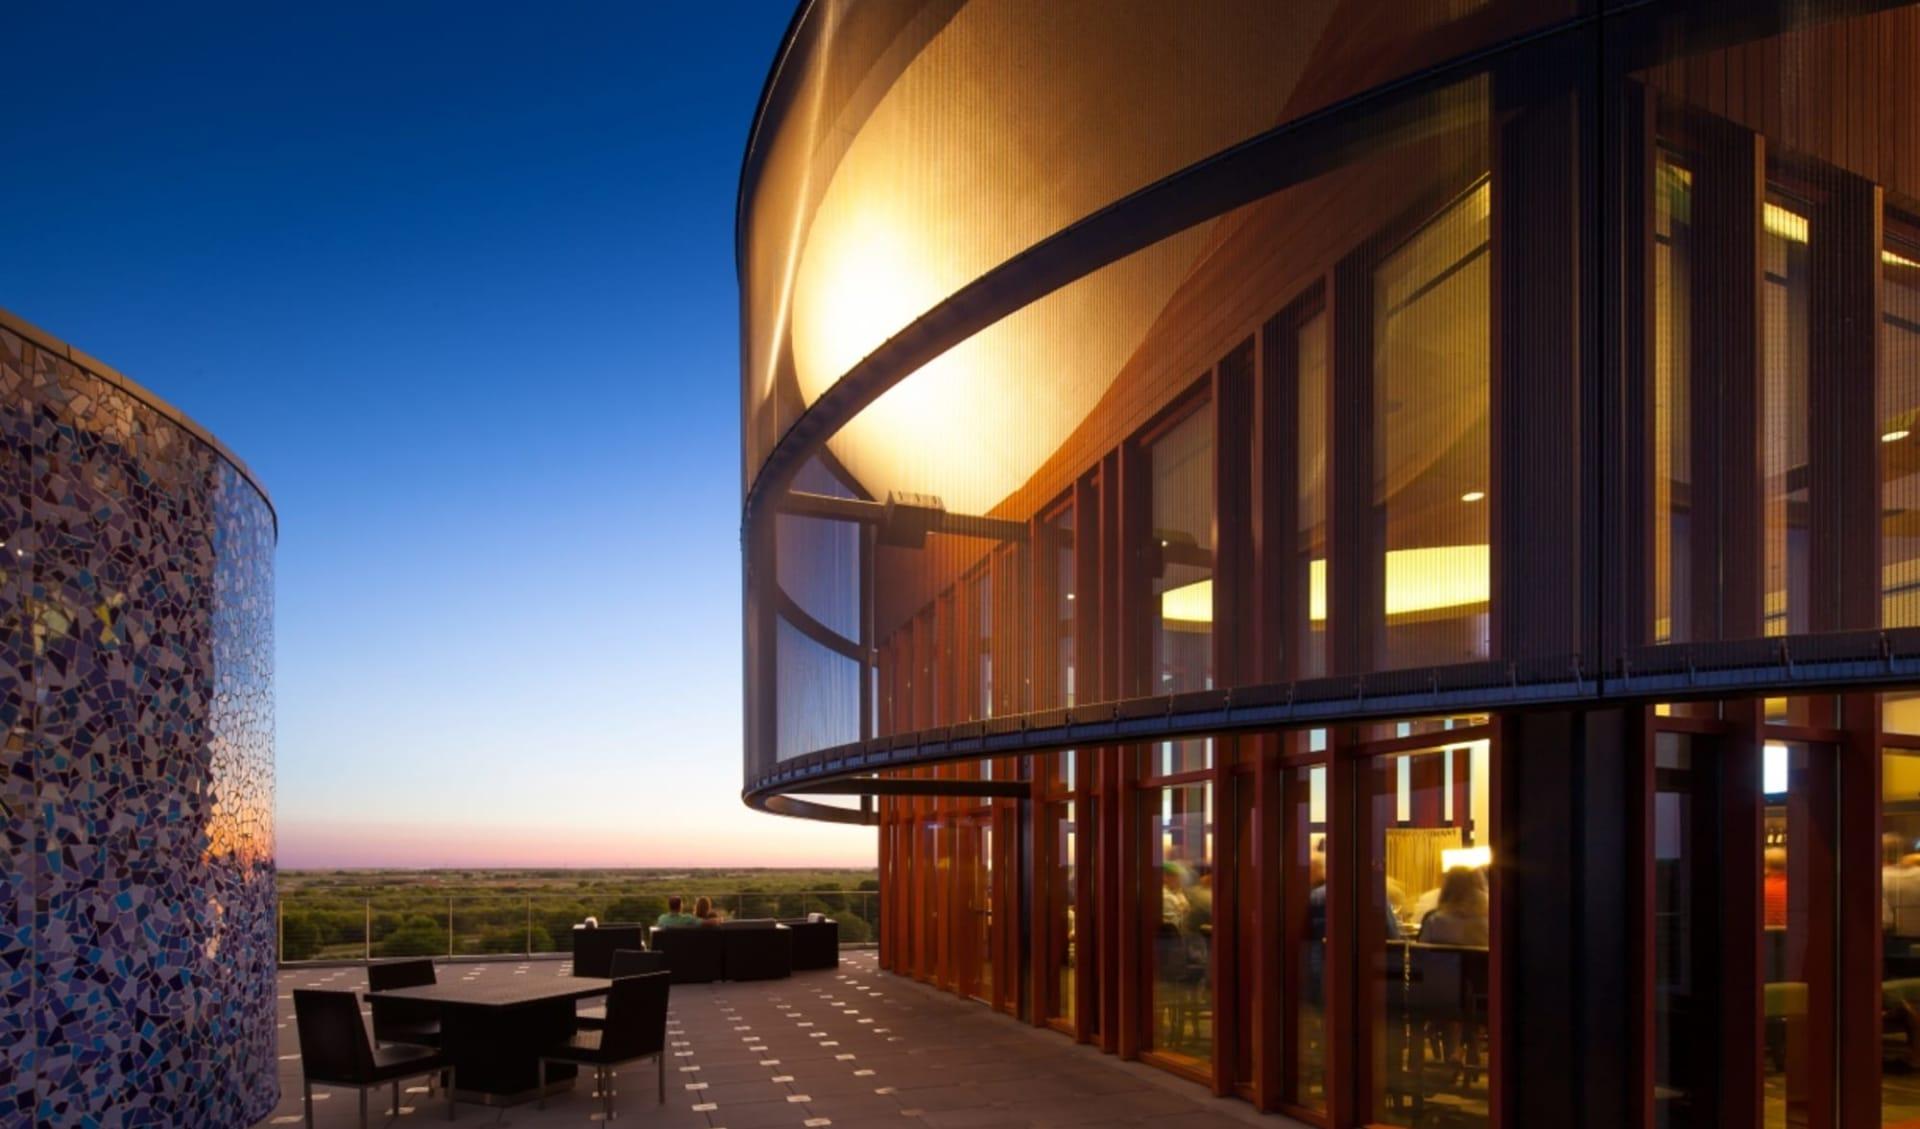 Streamsong Resort & Spa in Tampa:  Streamsong Resort & Spa - Restaurant Terrasse